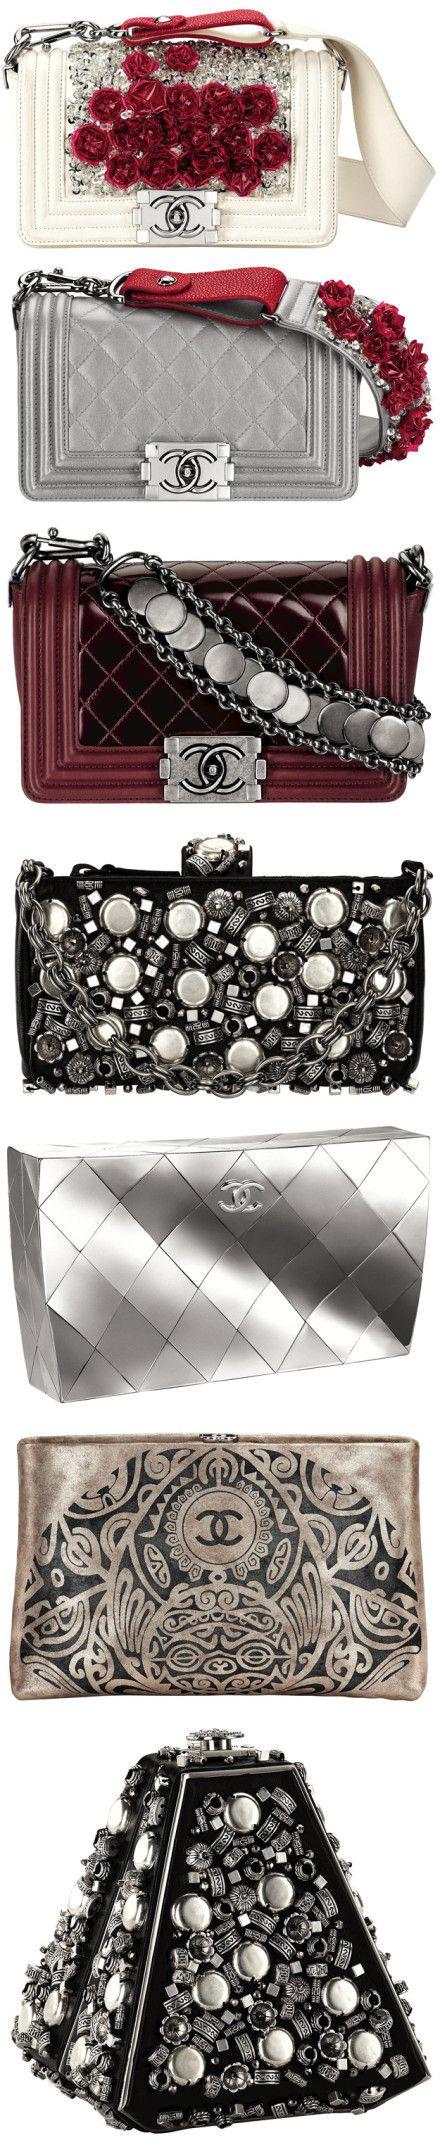 Chanel Chanel Chanel !!!